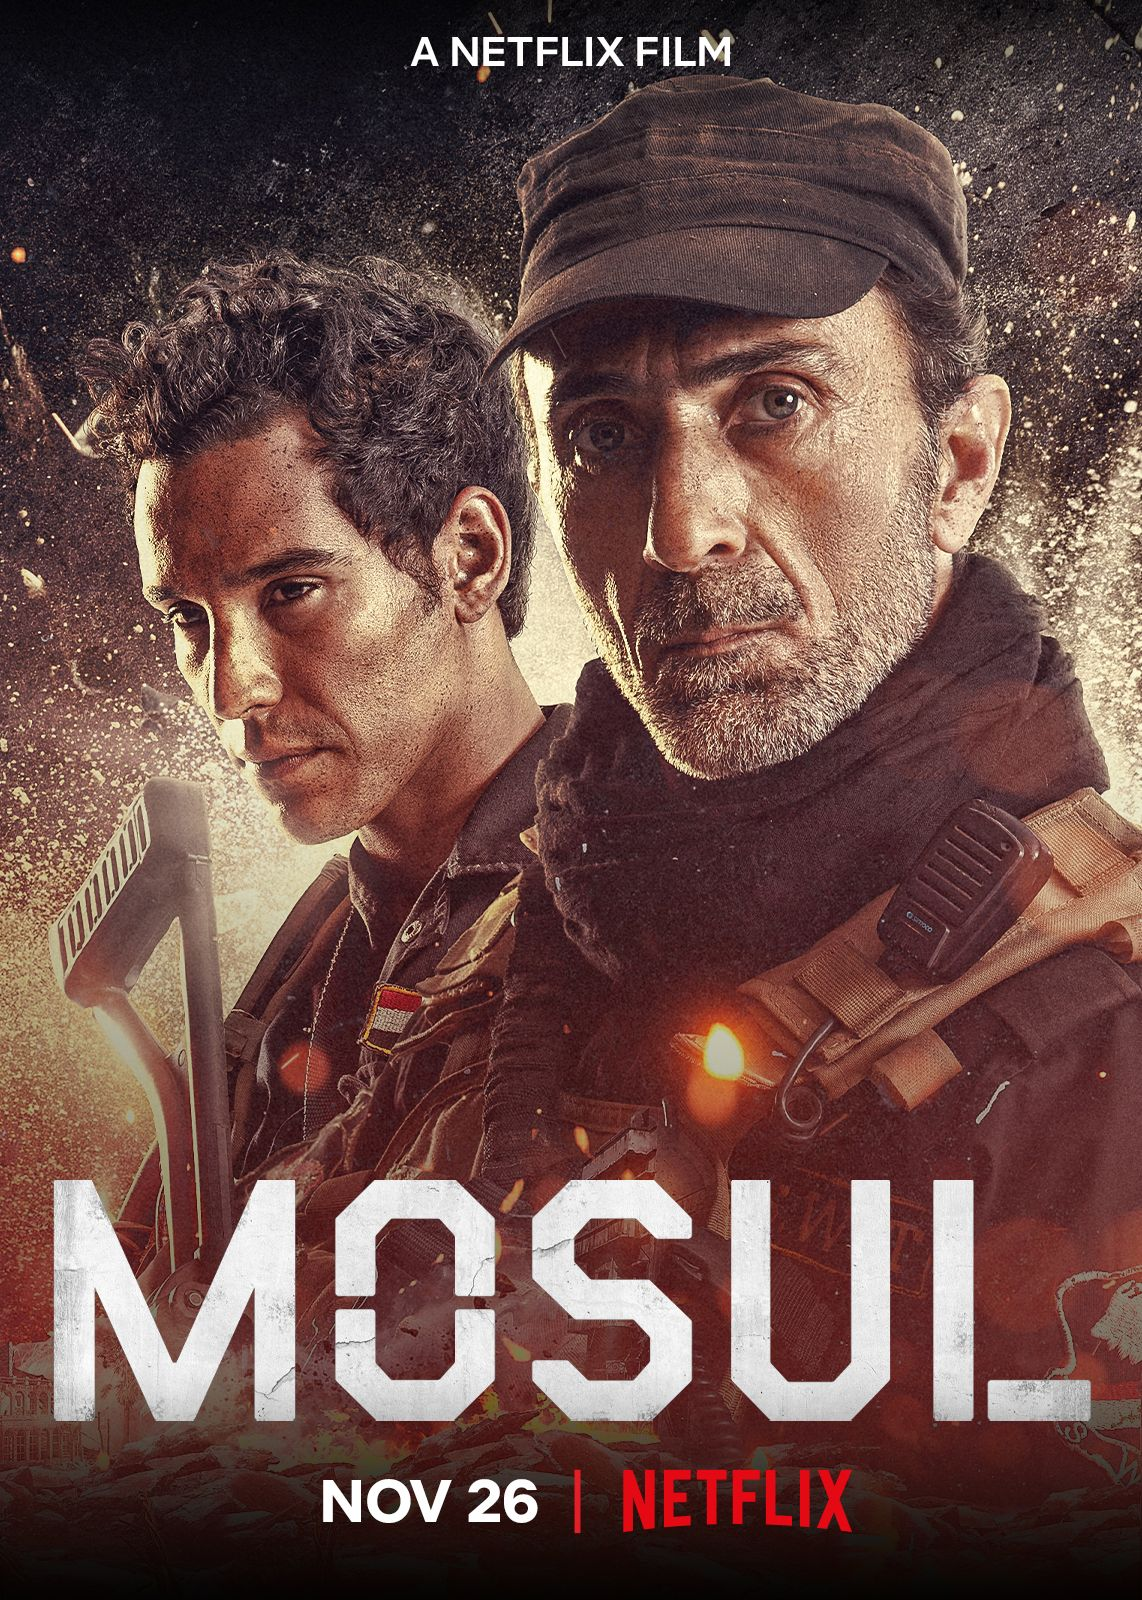 mosul-poster-netflix.jpg